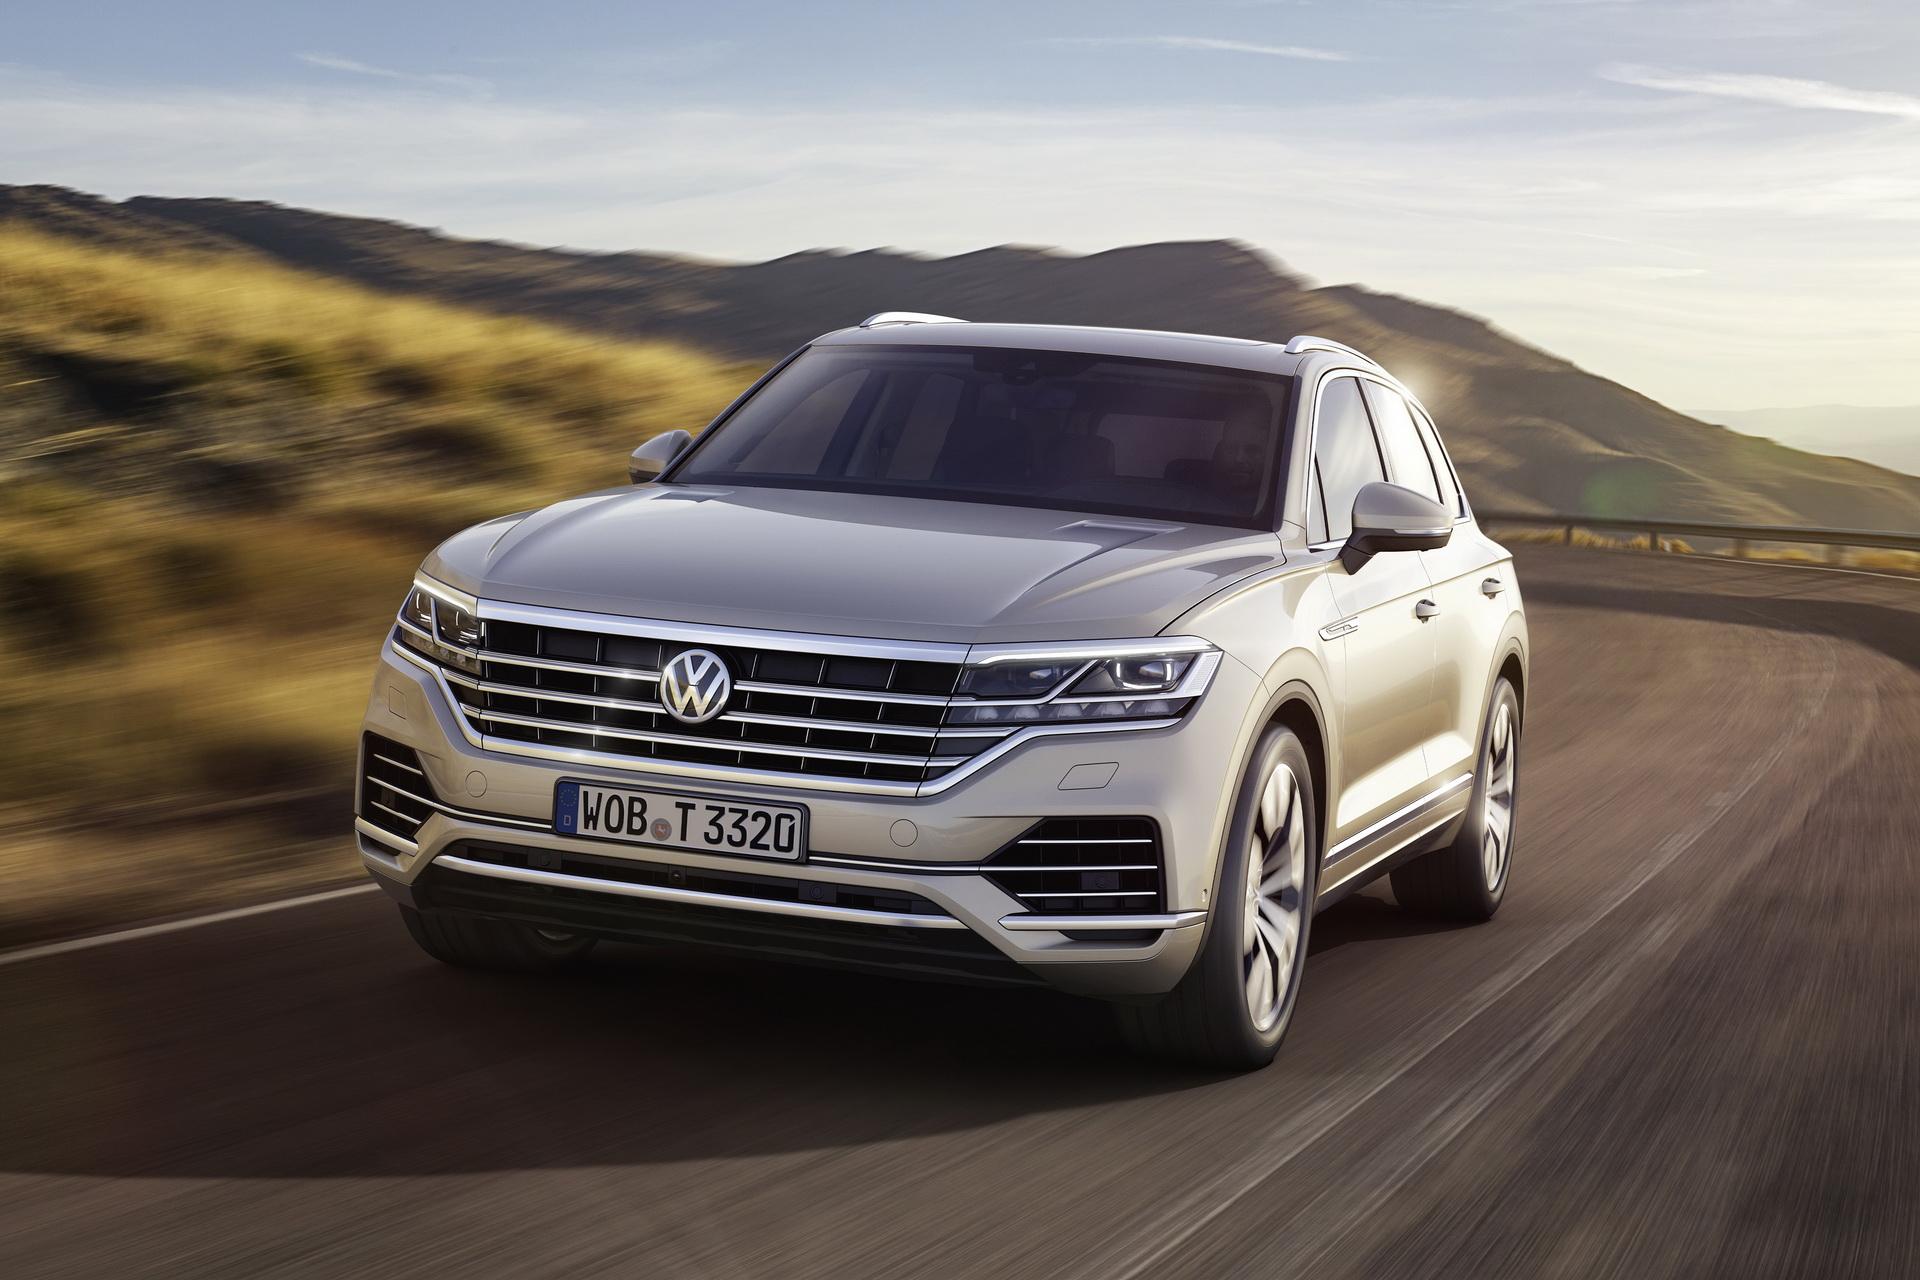 Volkswagen Touareg 2018 (4)